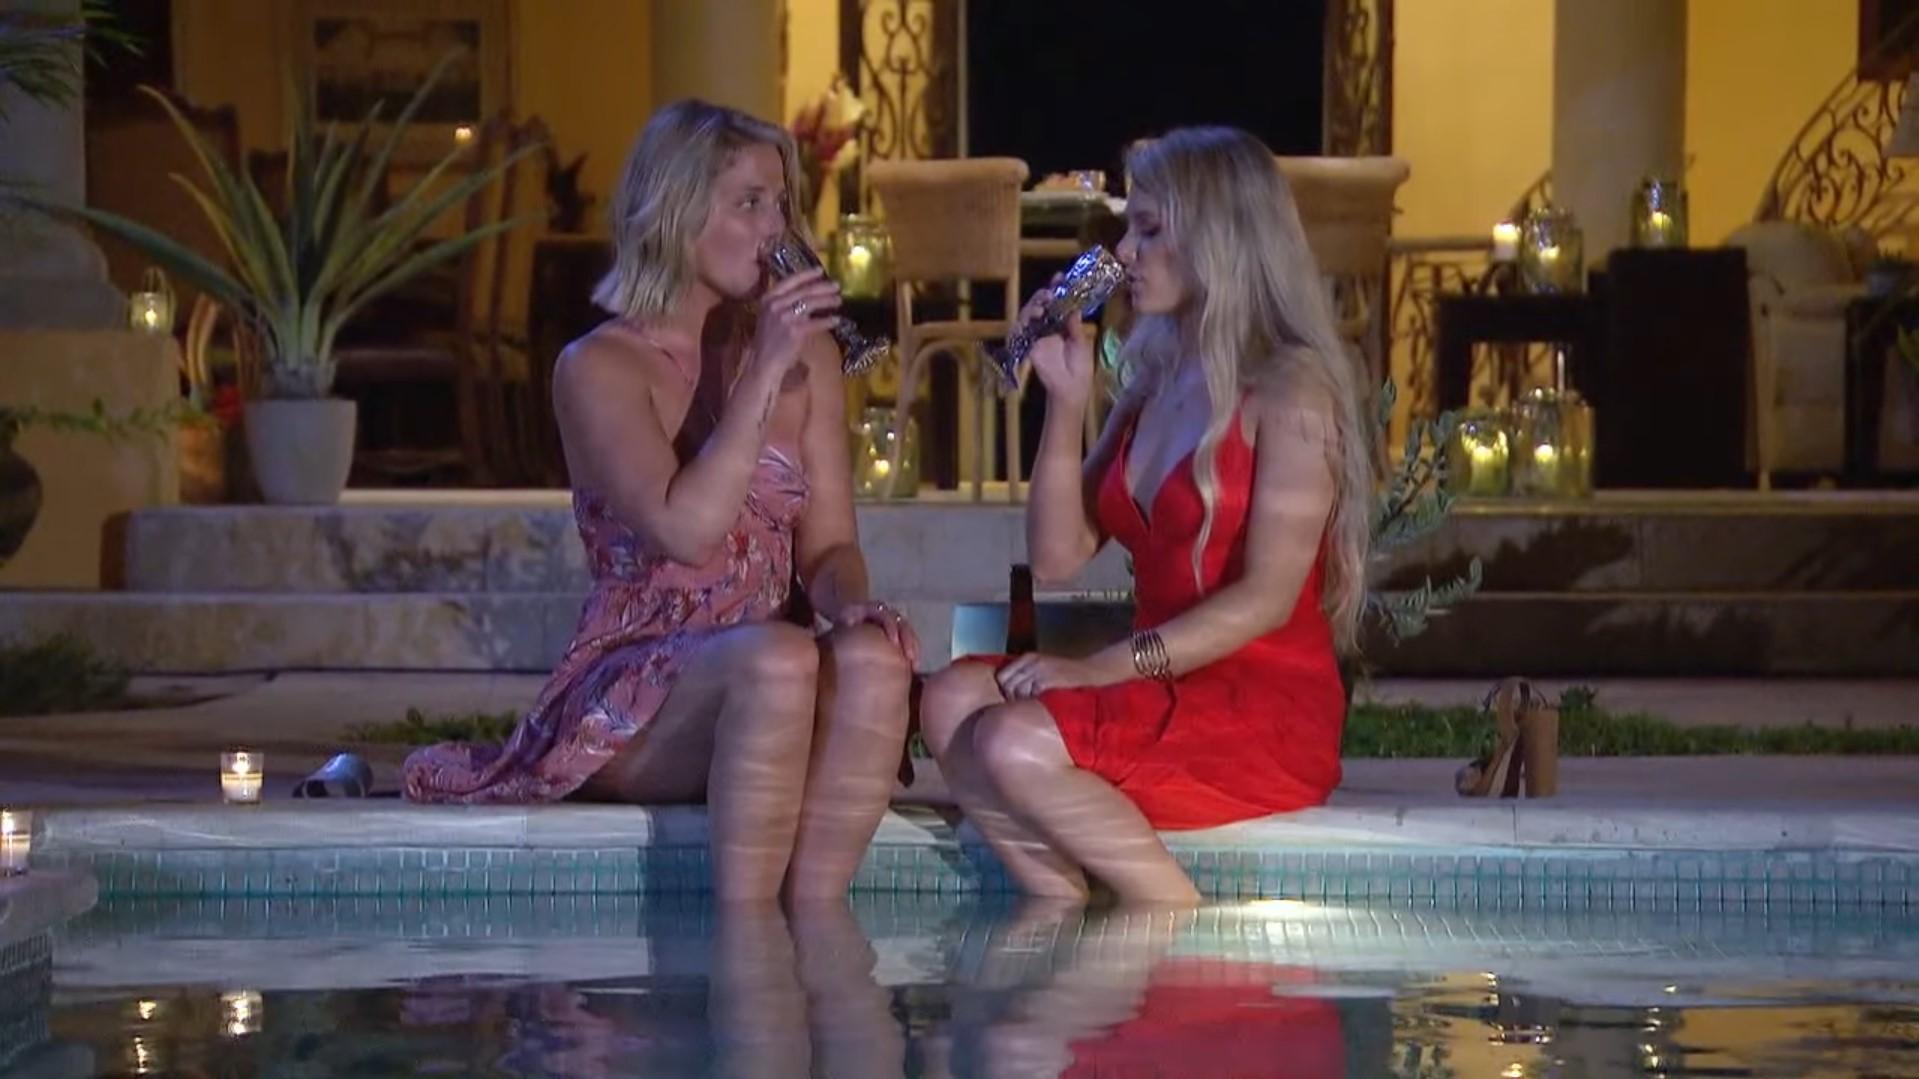 Bachelor In Paradise: Are Demi Burnett And Kristian Haggerty Still Friends?